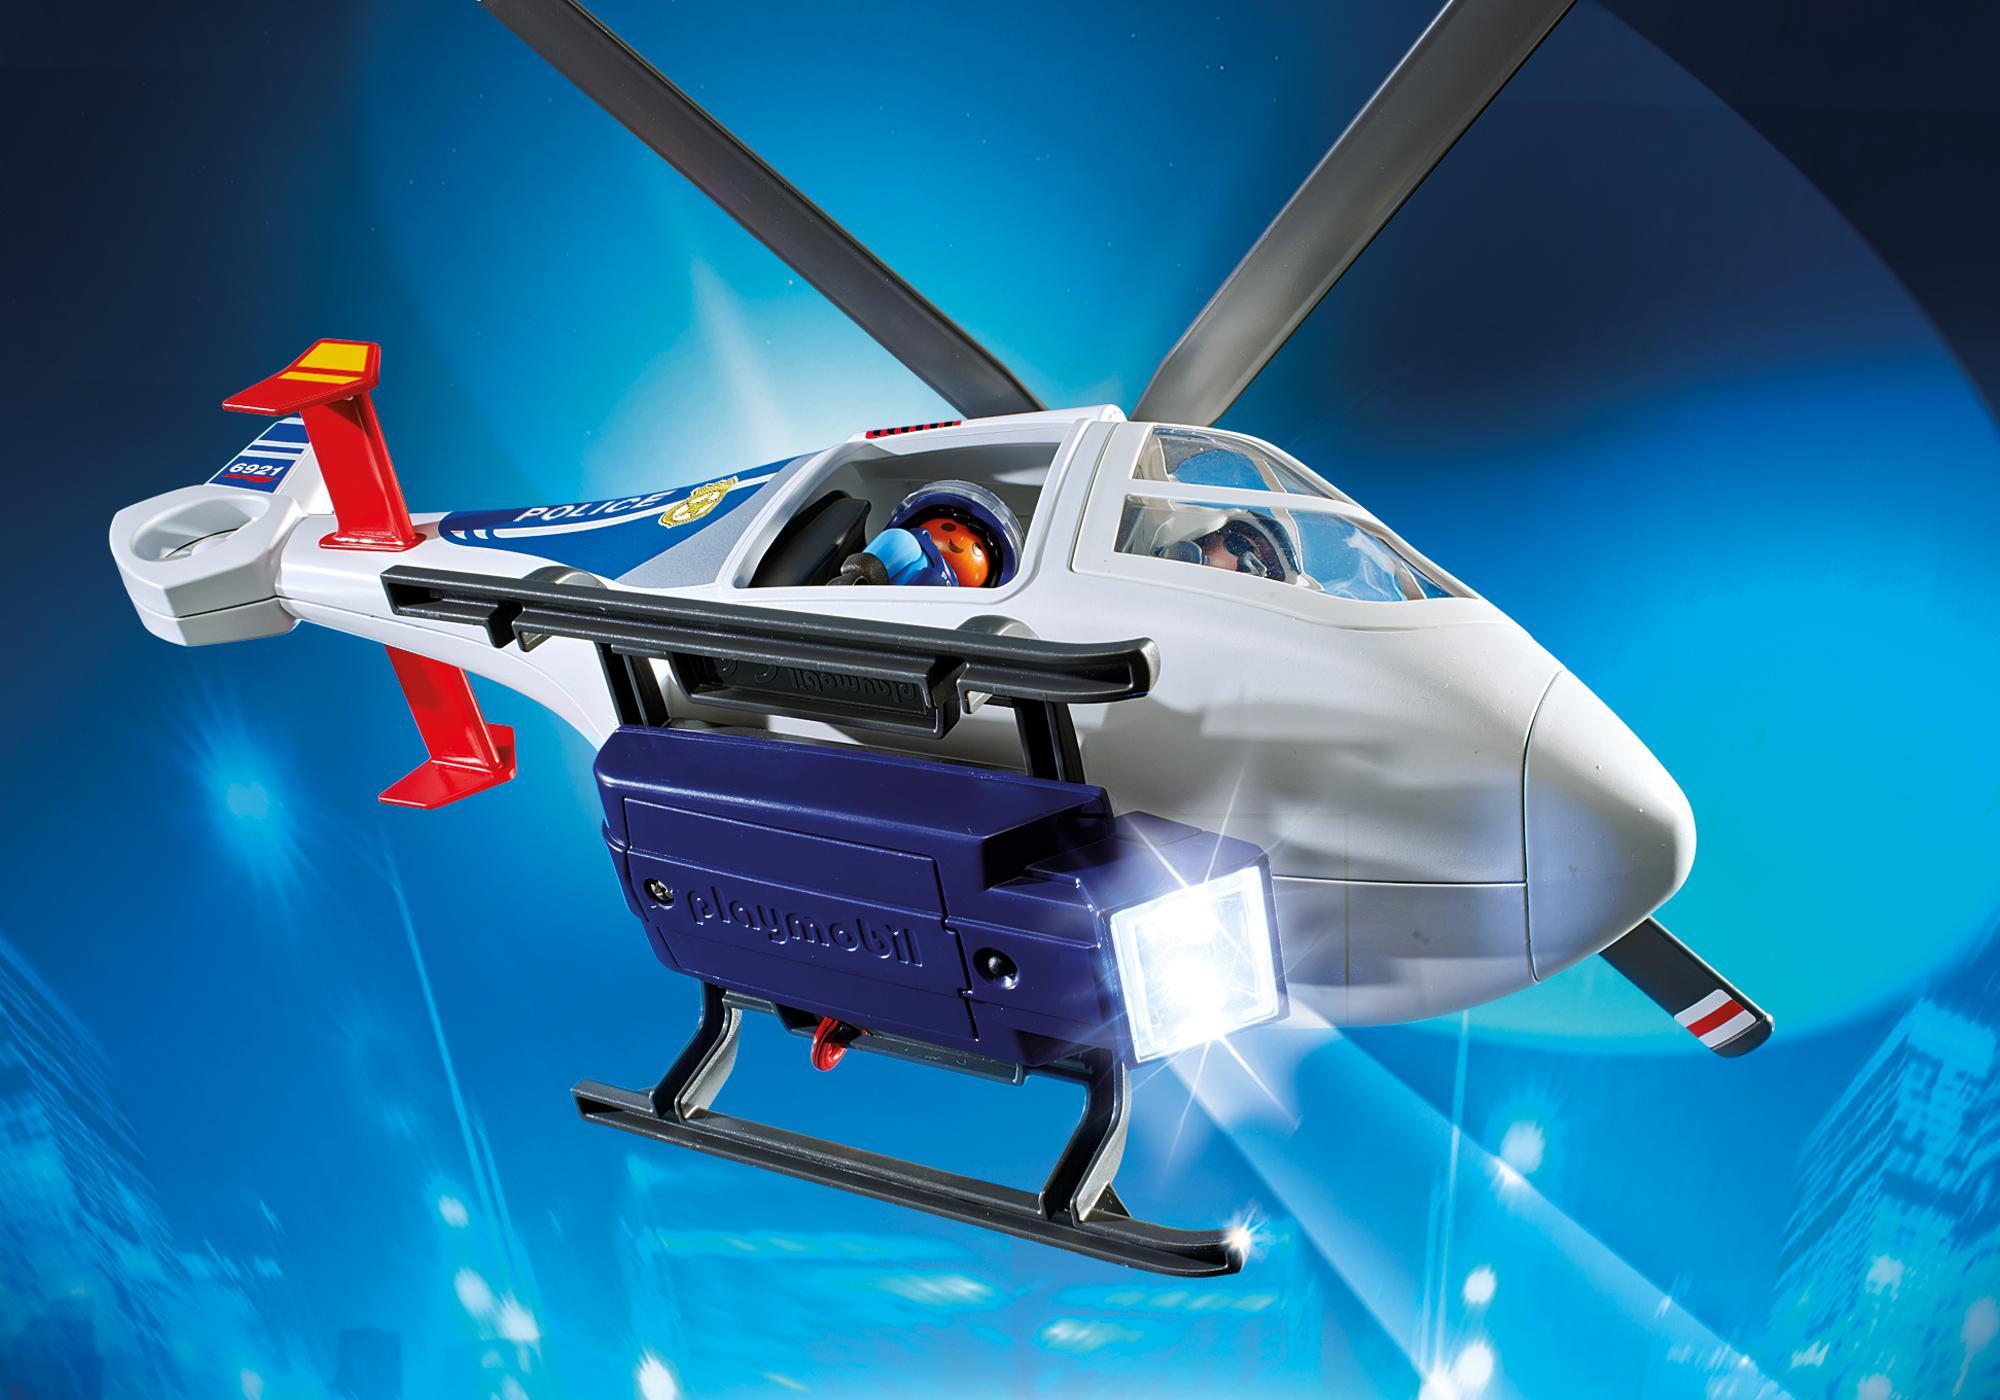 http://media.playmobil.com/i/playmobil/6921_product_extra3/Helicóptero de Policía con Luces LED